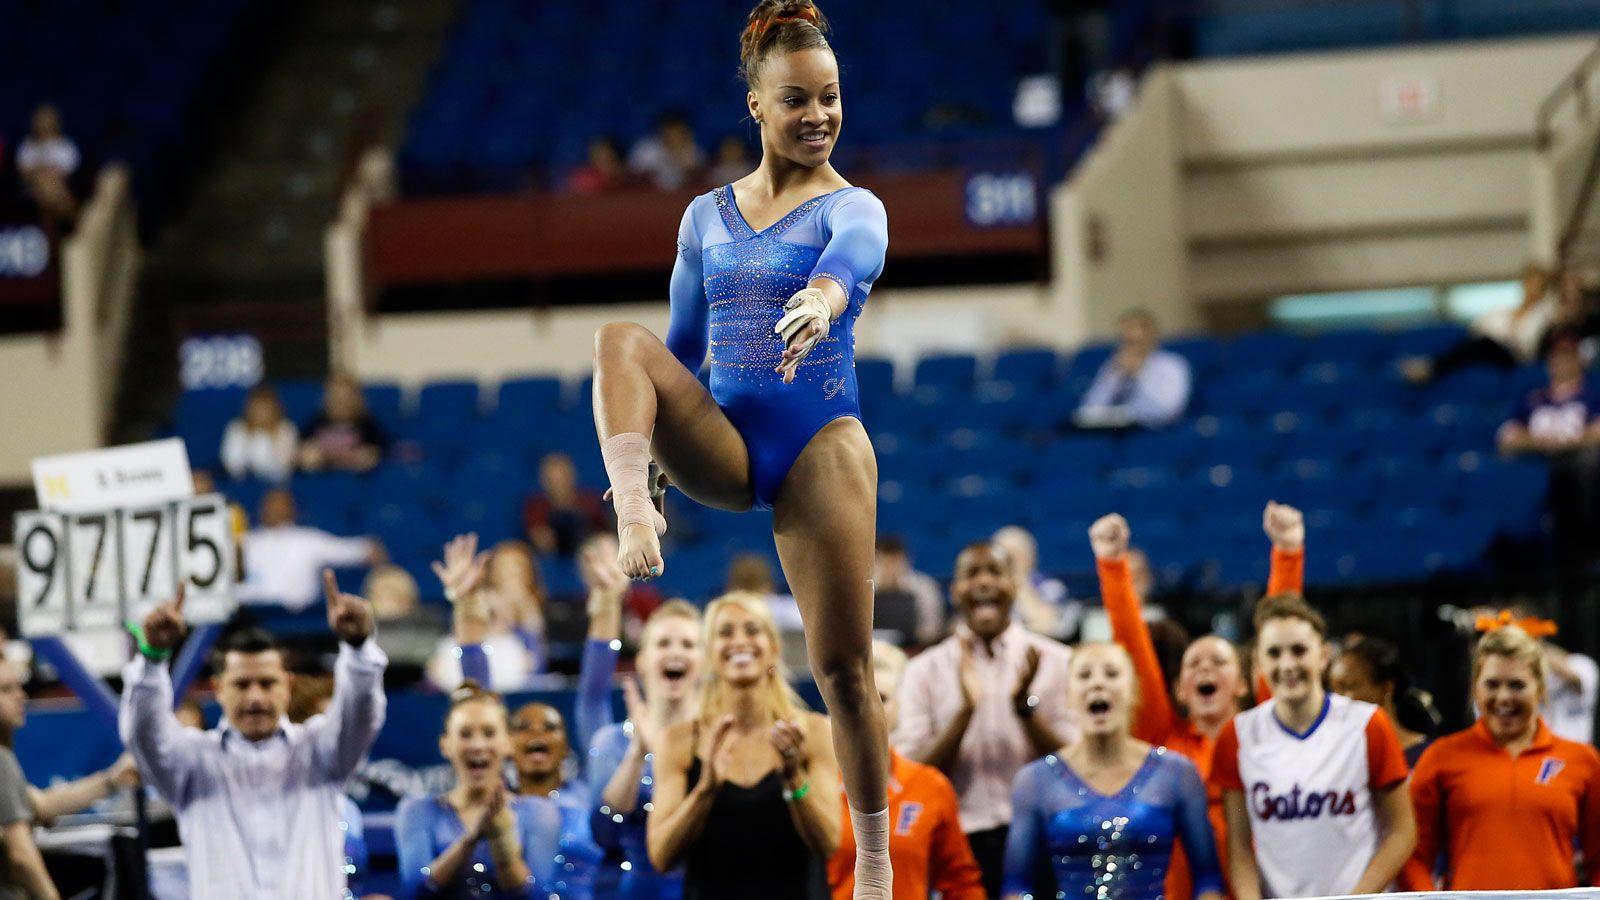 SEC at the NCAA Gymnastics Championships